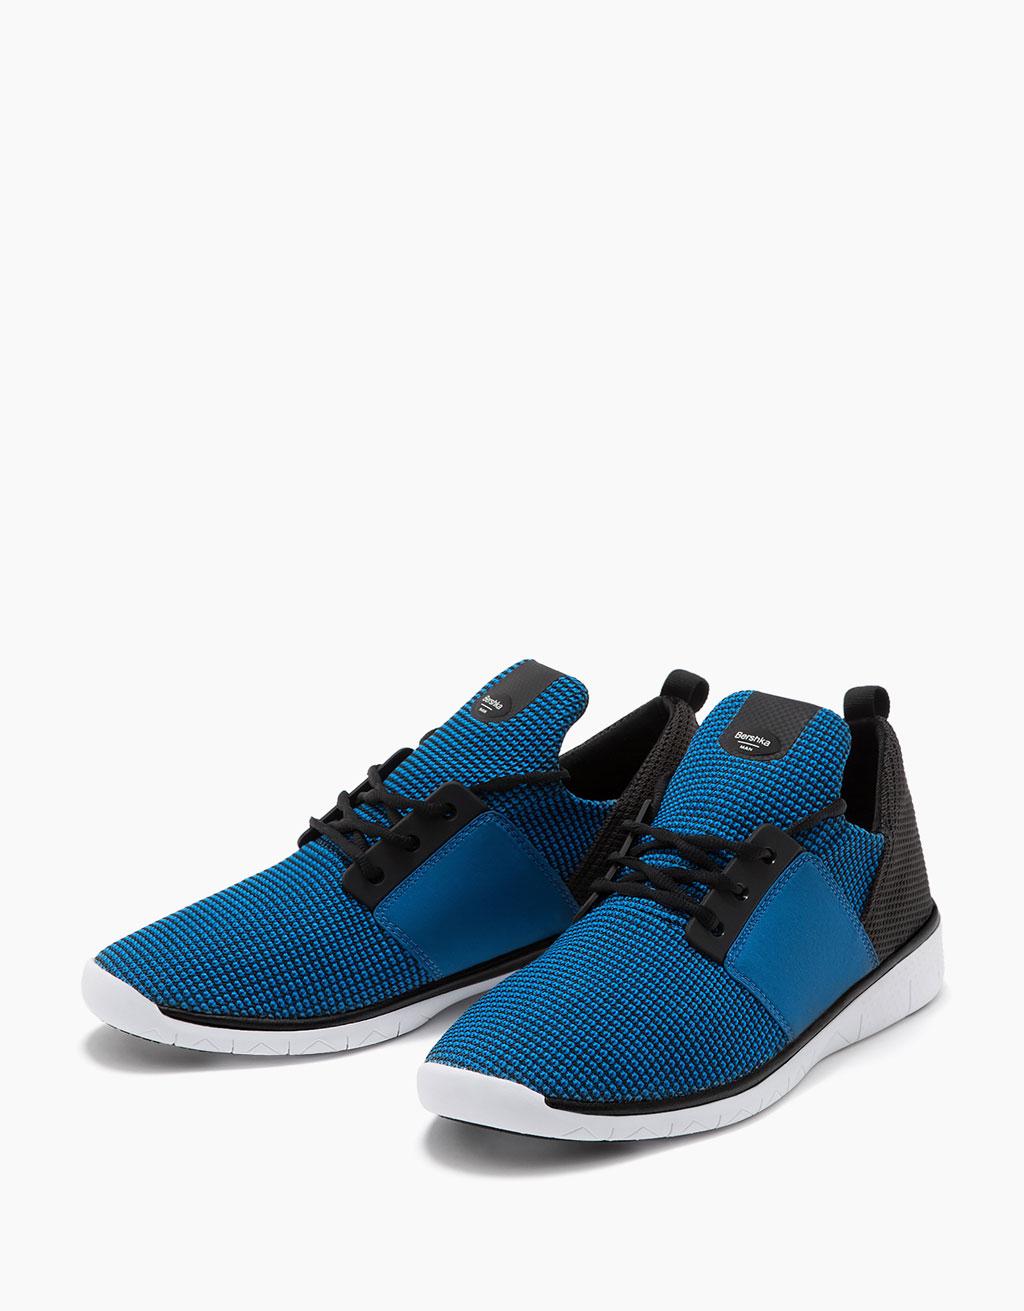 Men's technical fabric sneakers